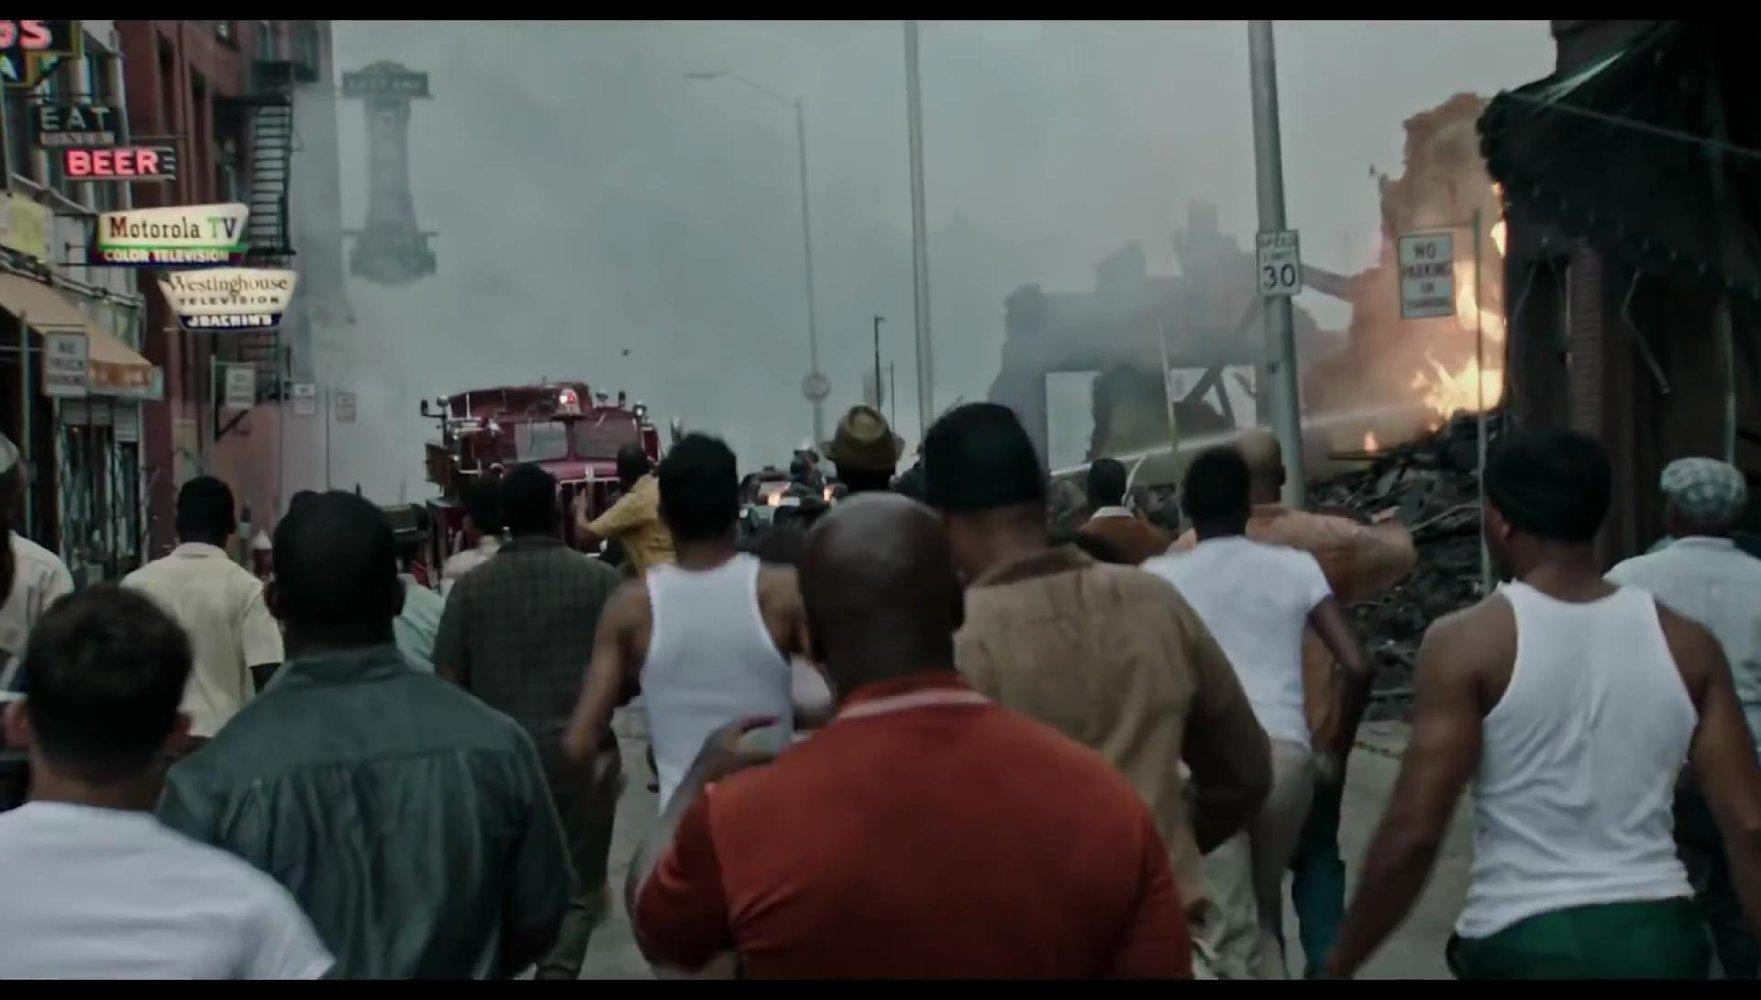 mv5bmwjjmgi2nzmty2vhzc00ywm4ltgxmdgtzgrkzjcxnmy1owu4xkeyxkfqcgdeqxvynjk2mji2nty  v1 sy1000 cr0017611000 al  In the Heat of Detroit: 50 Years of Tension